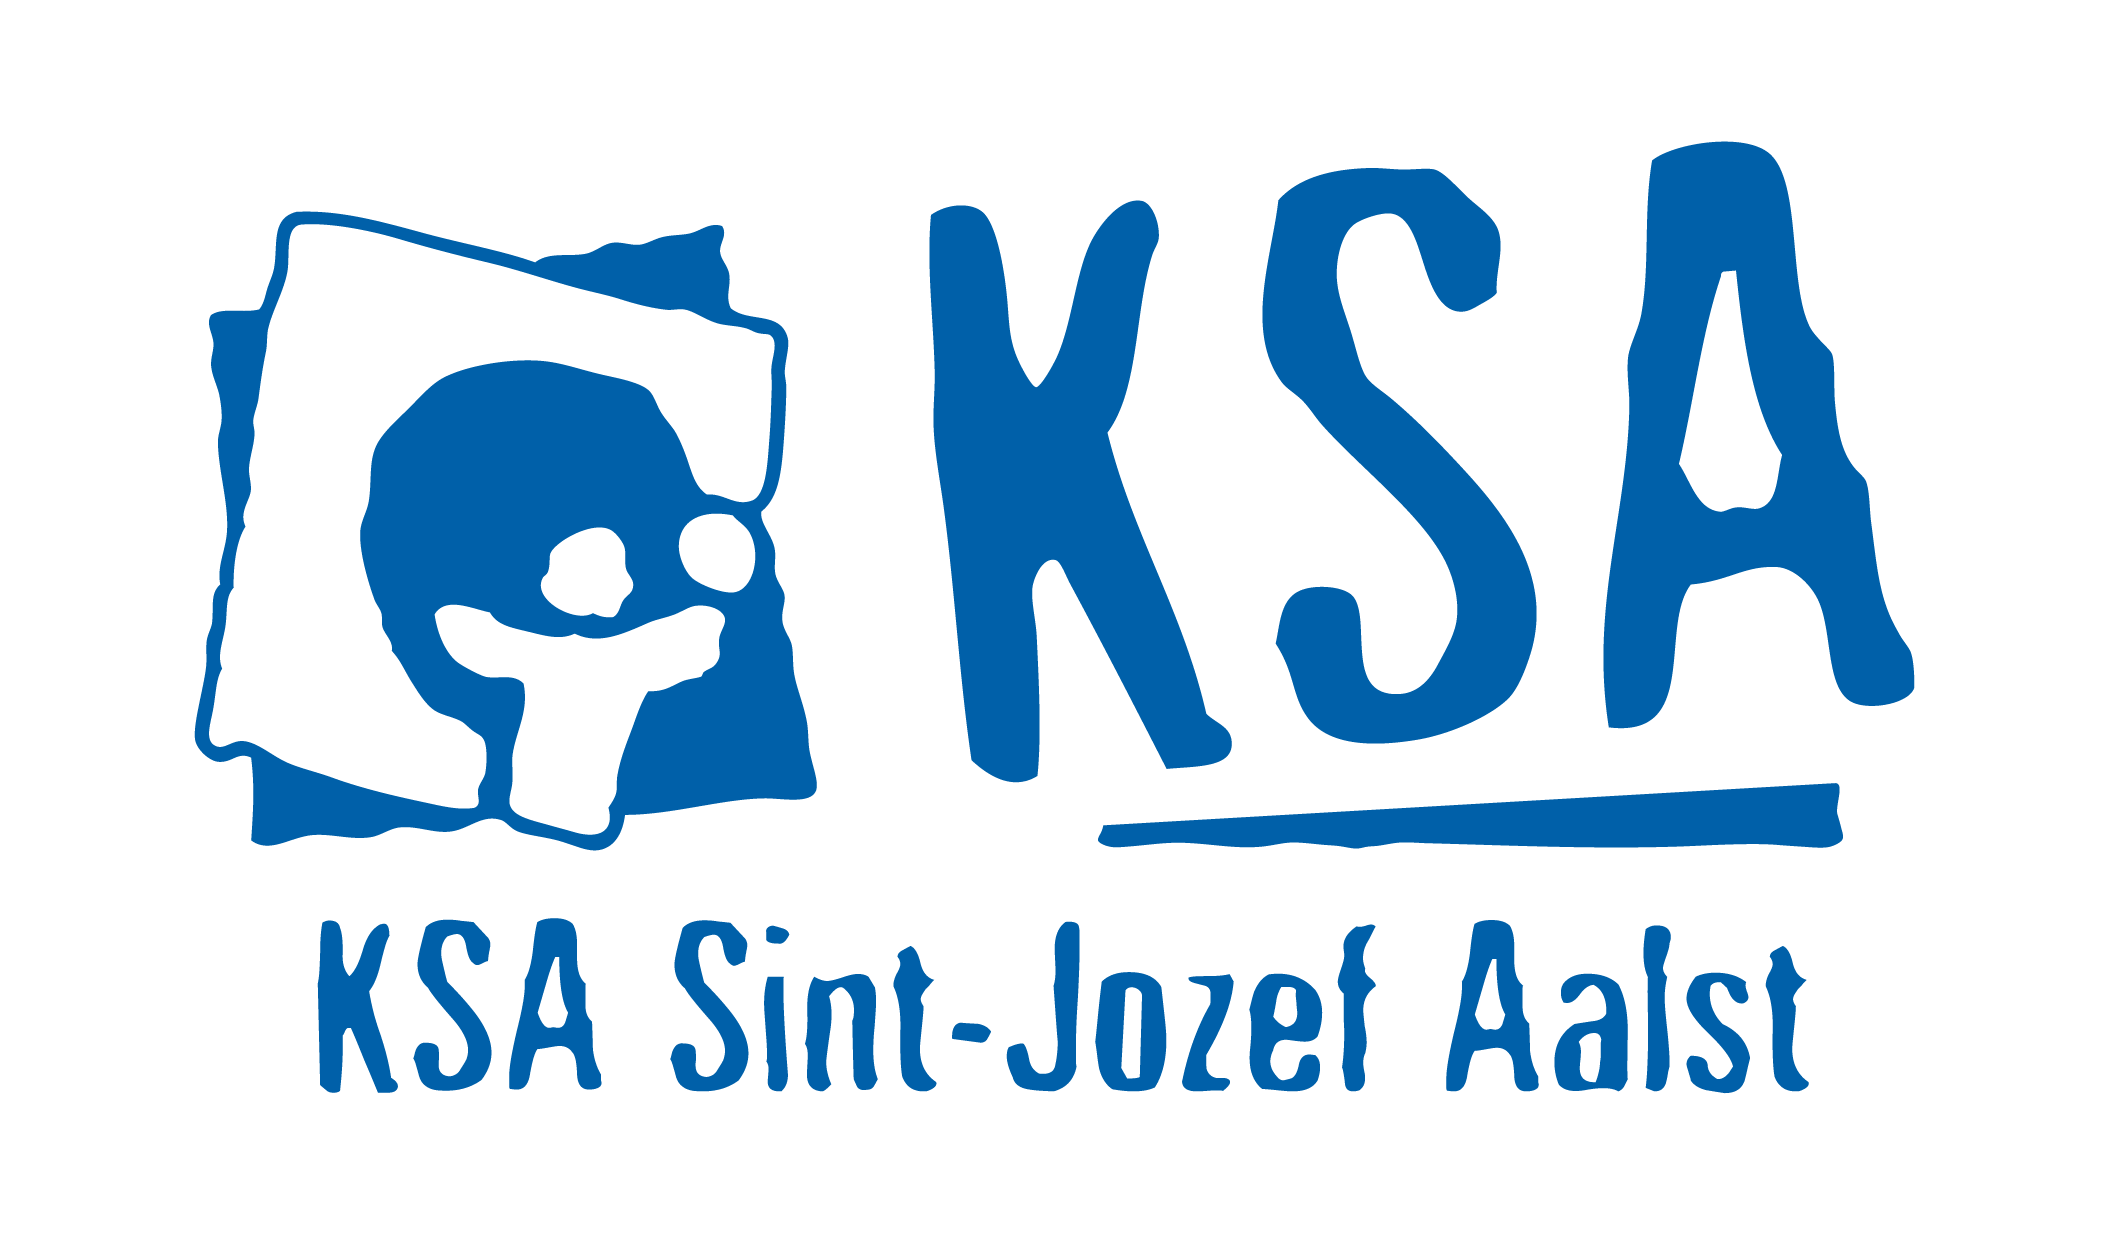 KSA Sint-Jozef Aalst